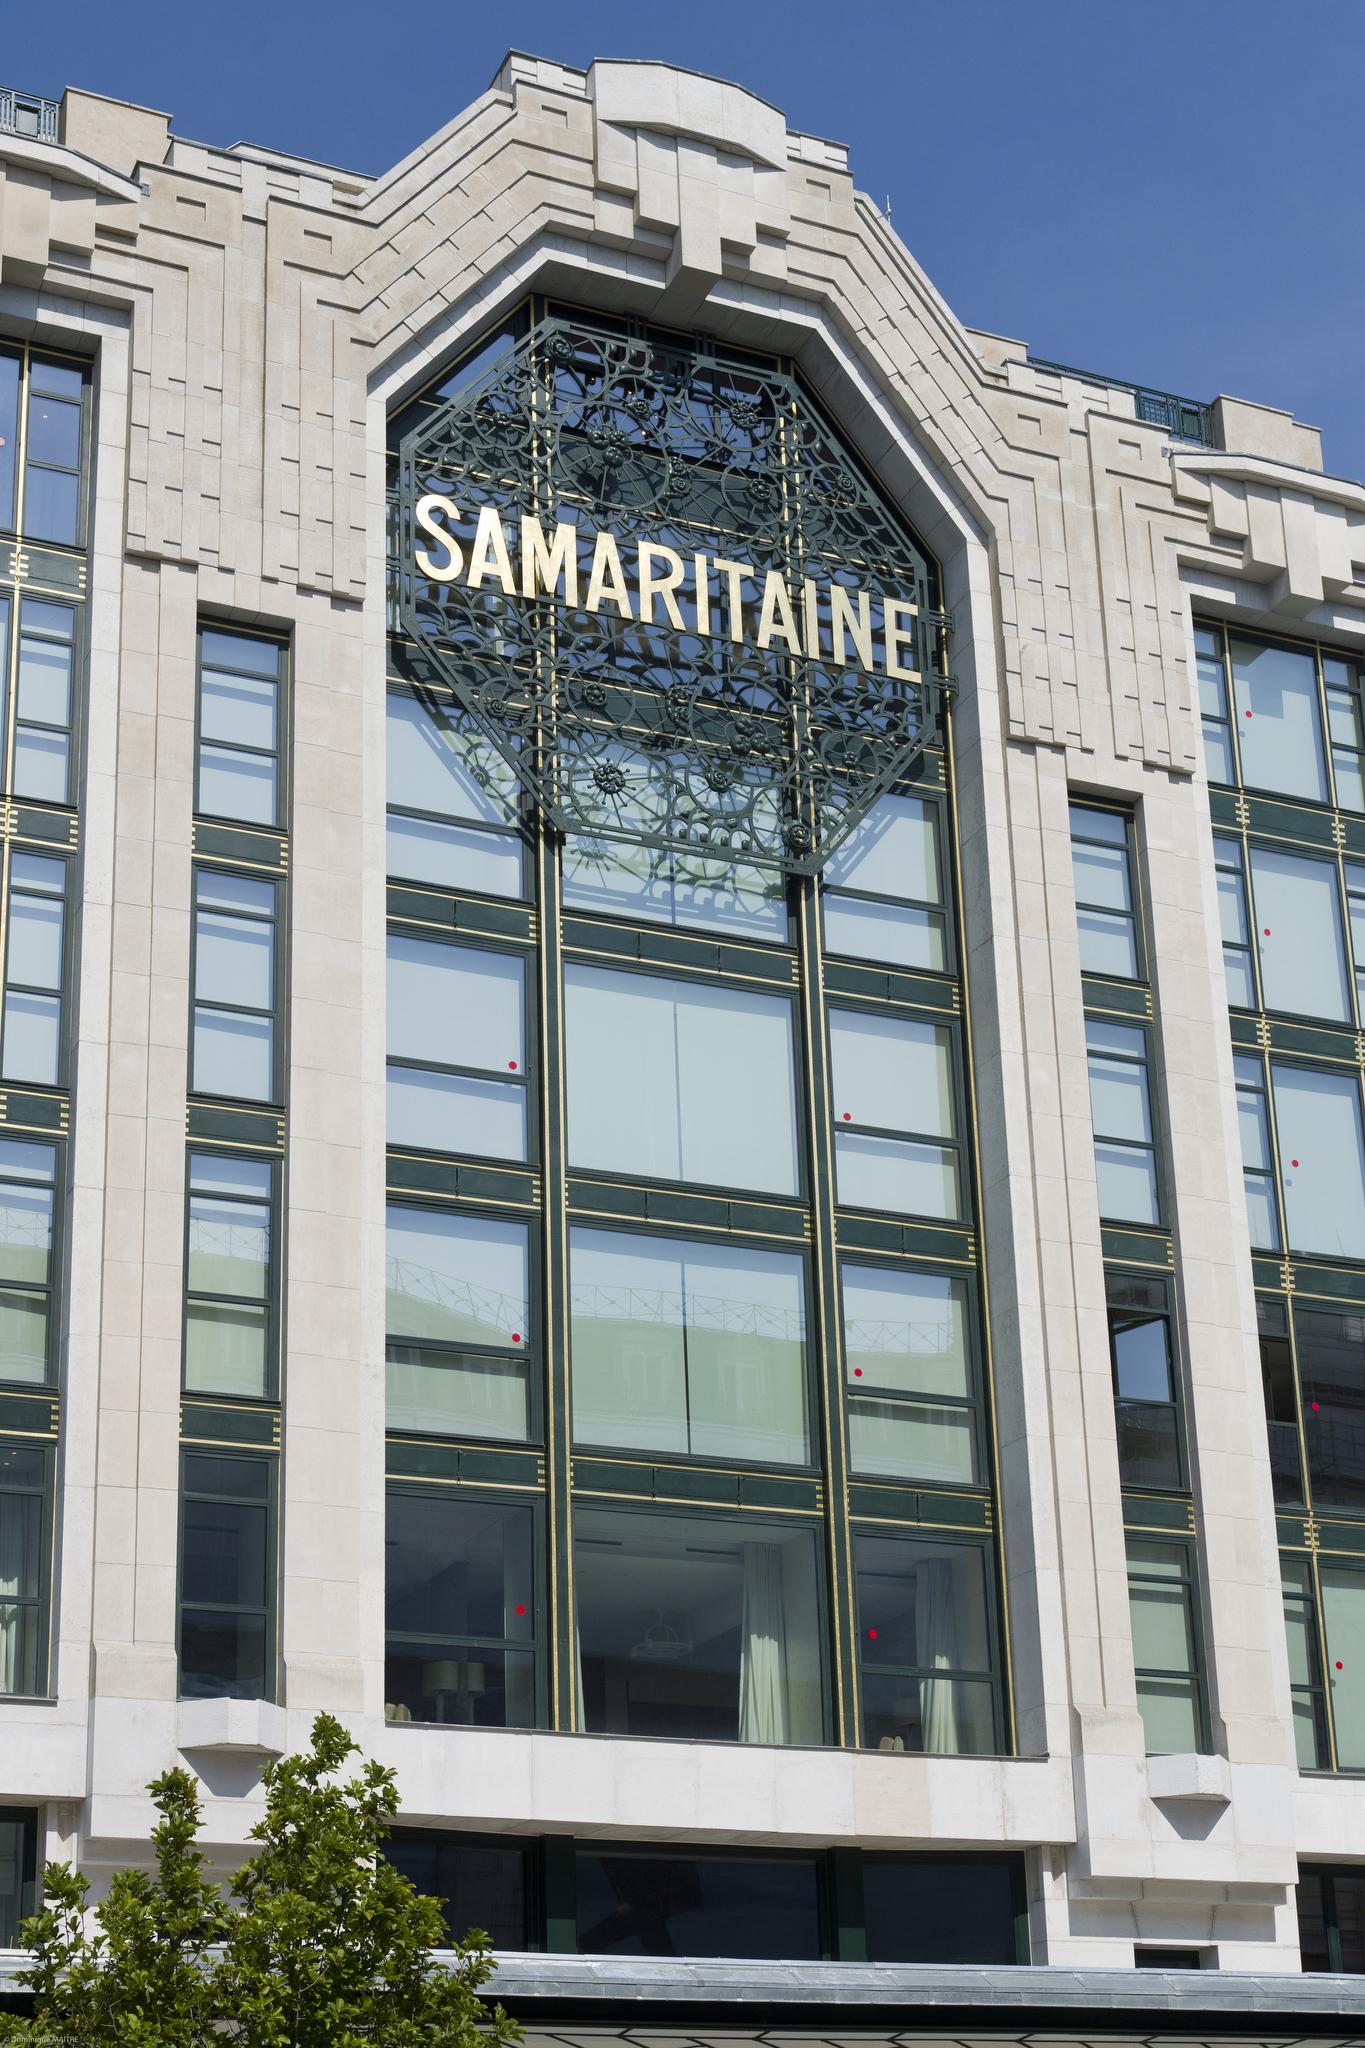 Inside the Temple of Parisian Lifestyle: Pictures of La Samaritaine